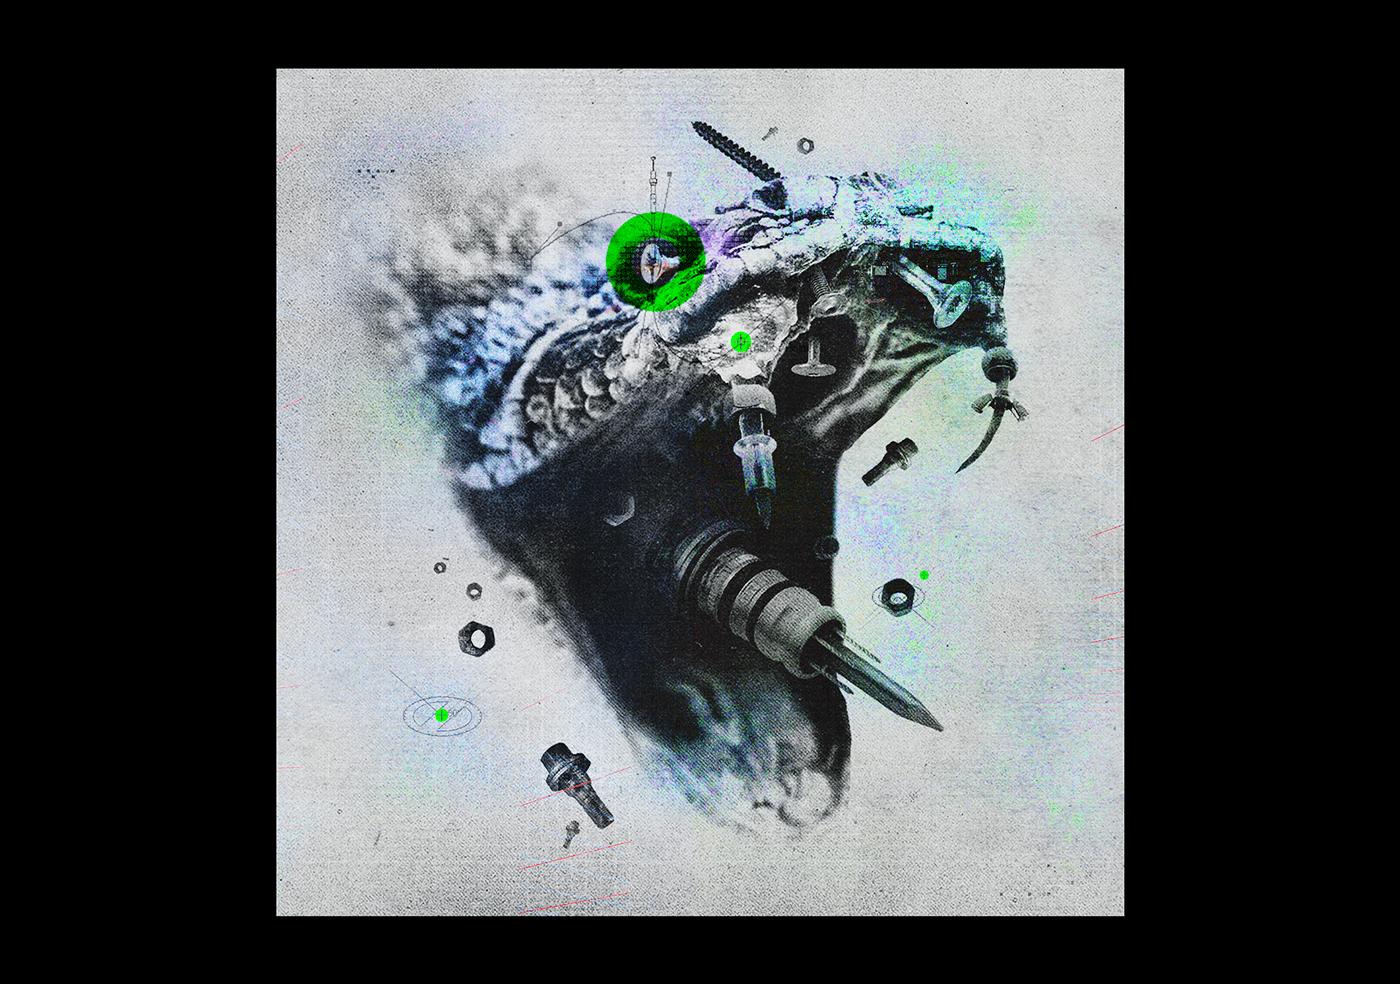 collage Cover Art dark graphic art Photo Composite photomanipulation photomontage photoshop surreal ILLUSTRATION